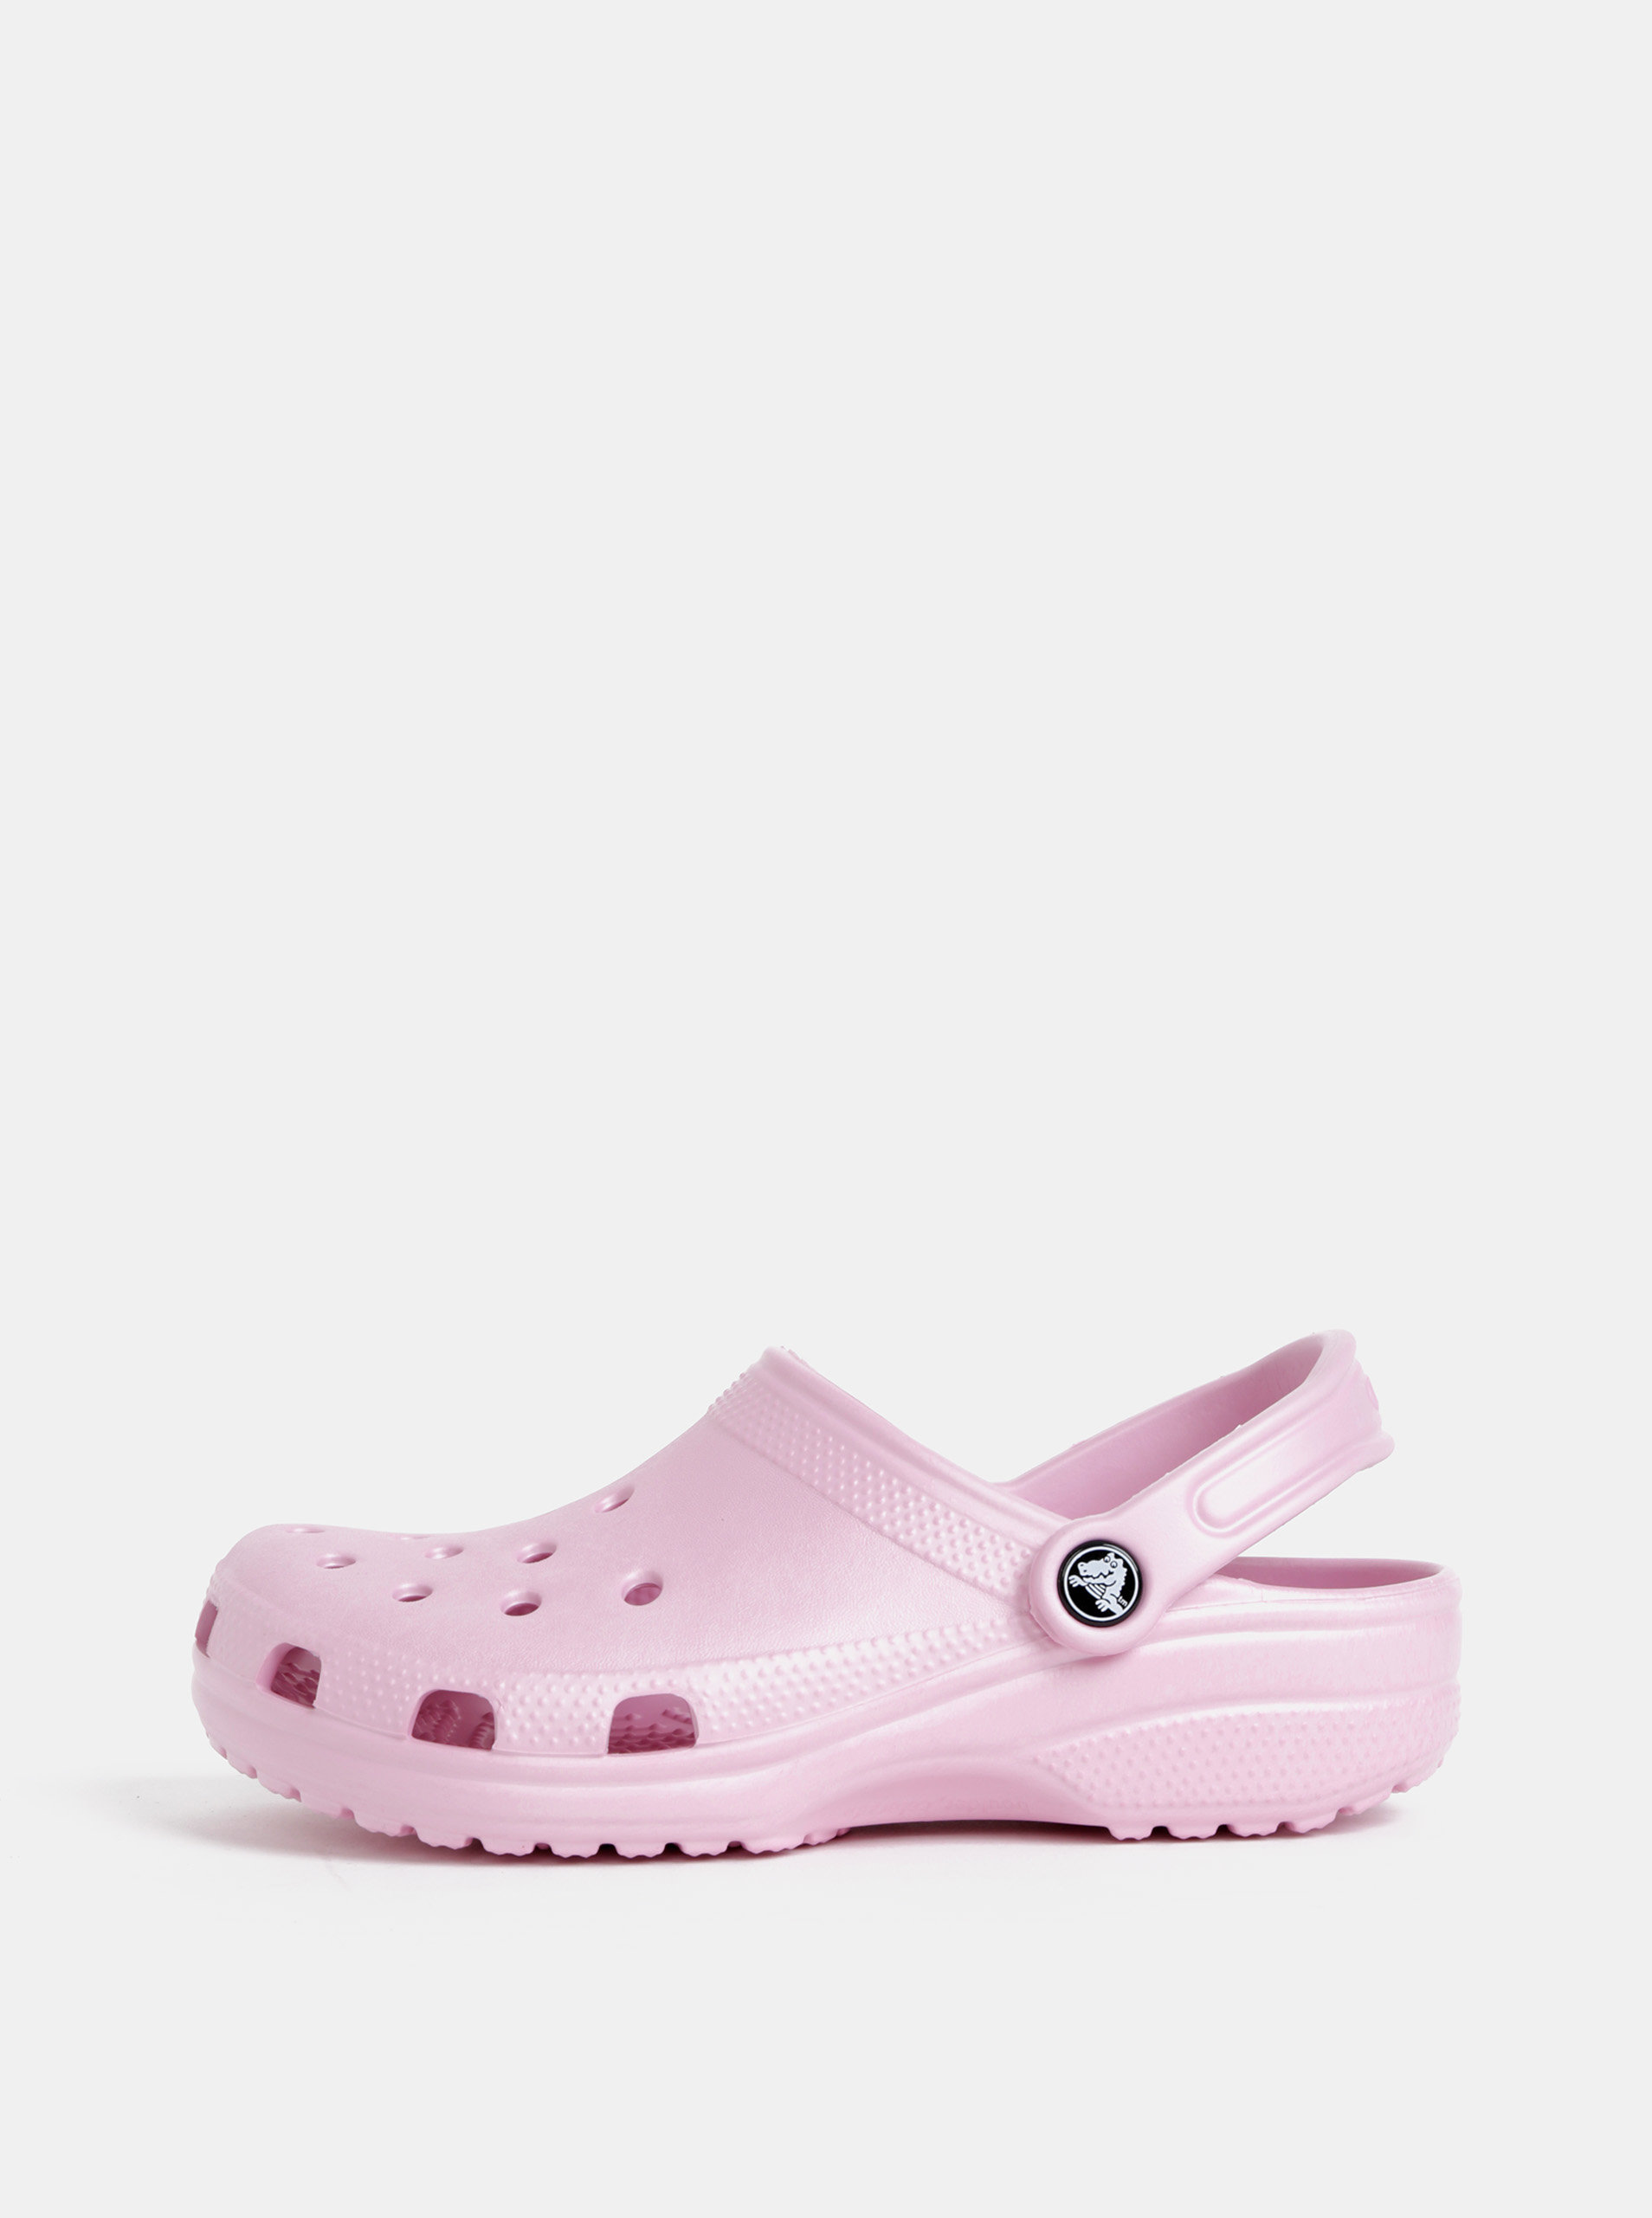 060539f5da26b Ružové dámske šľapky Crocs Classic Clog | ZOOT.sk